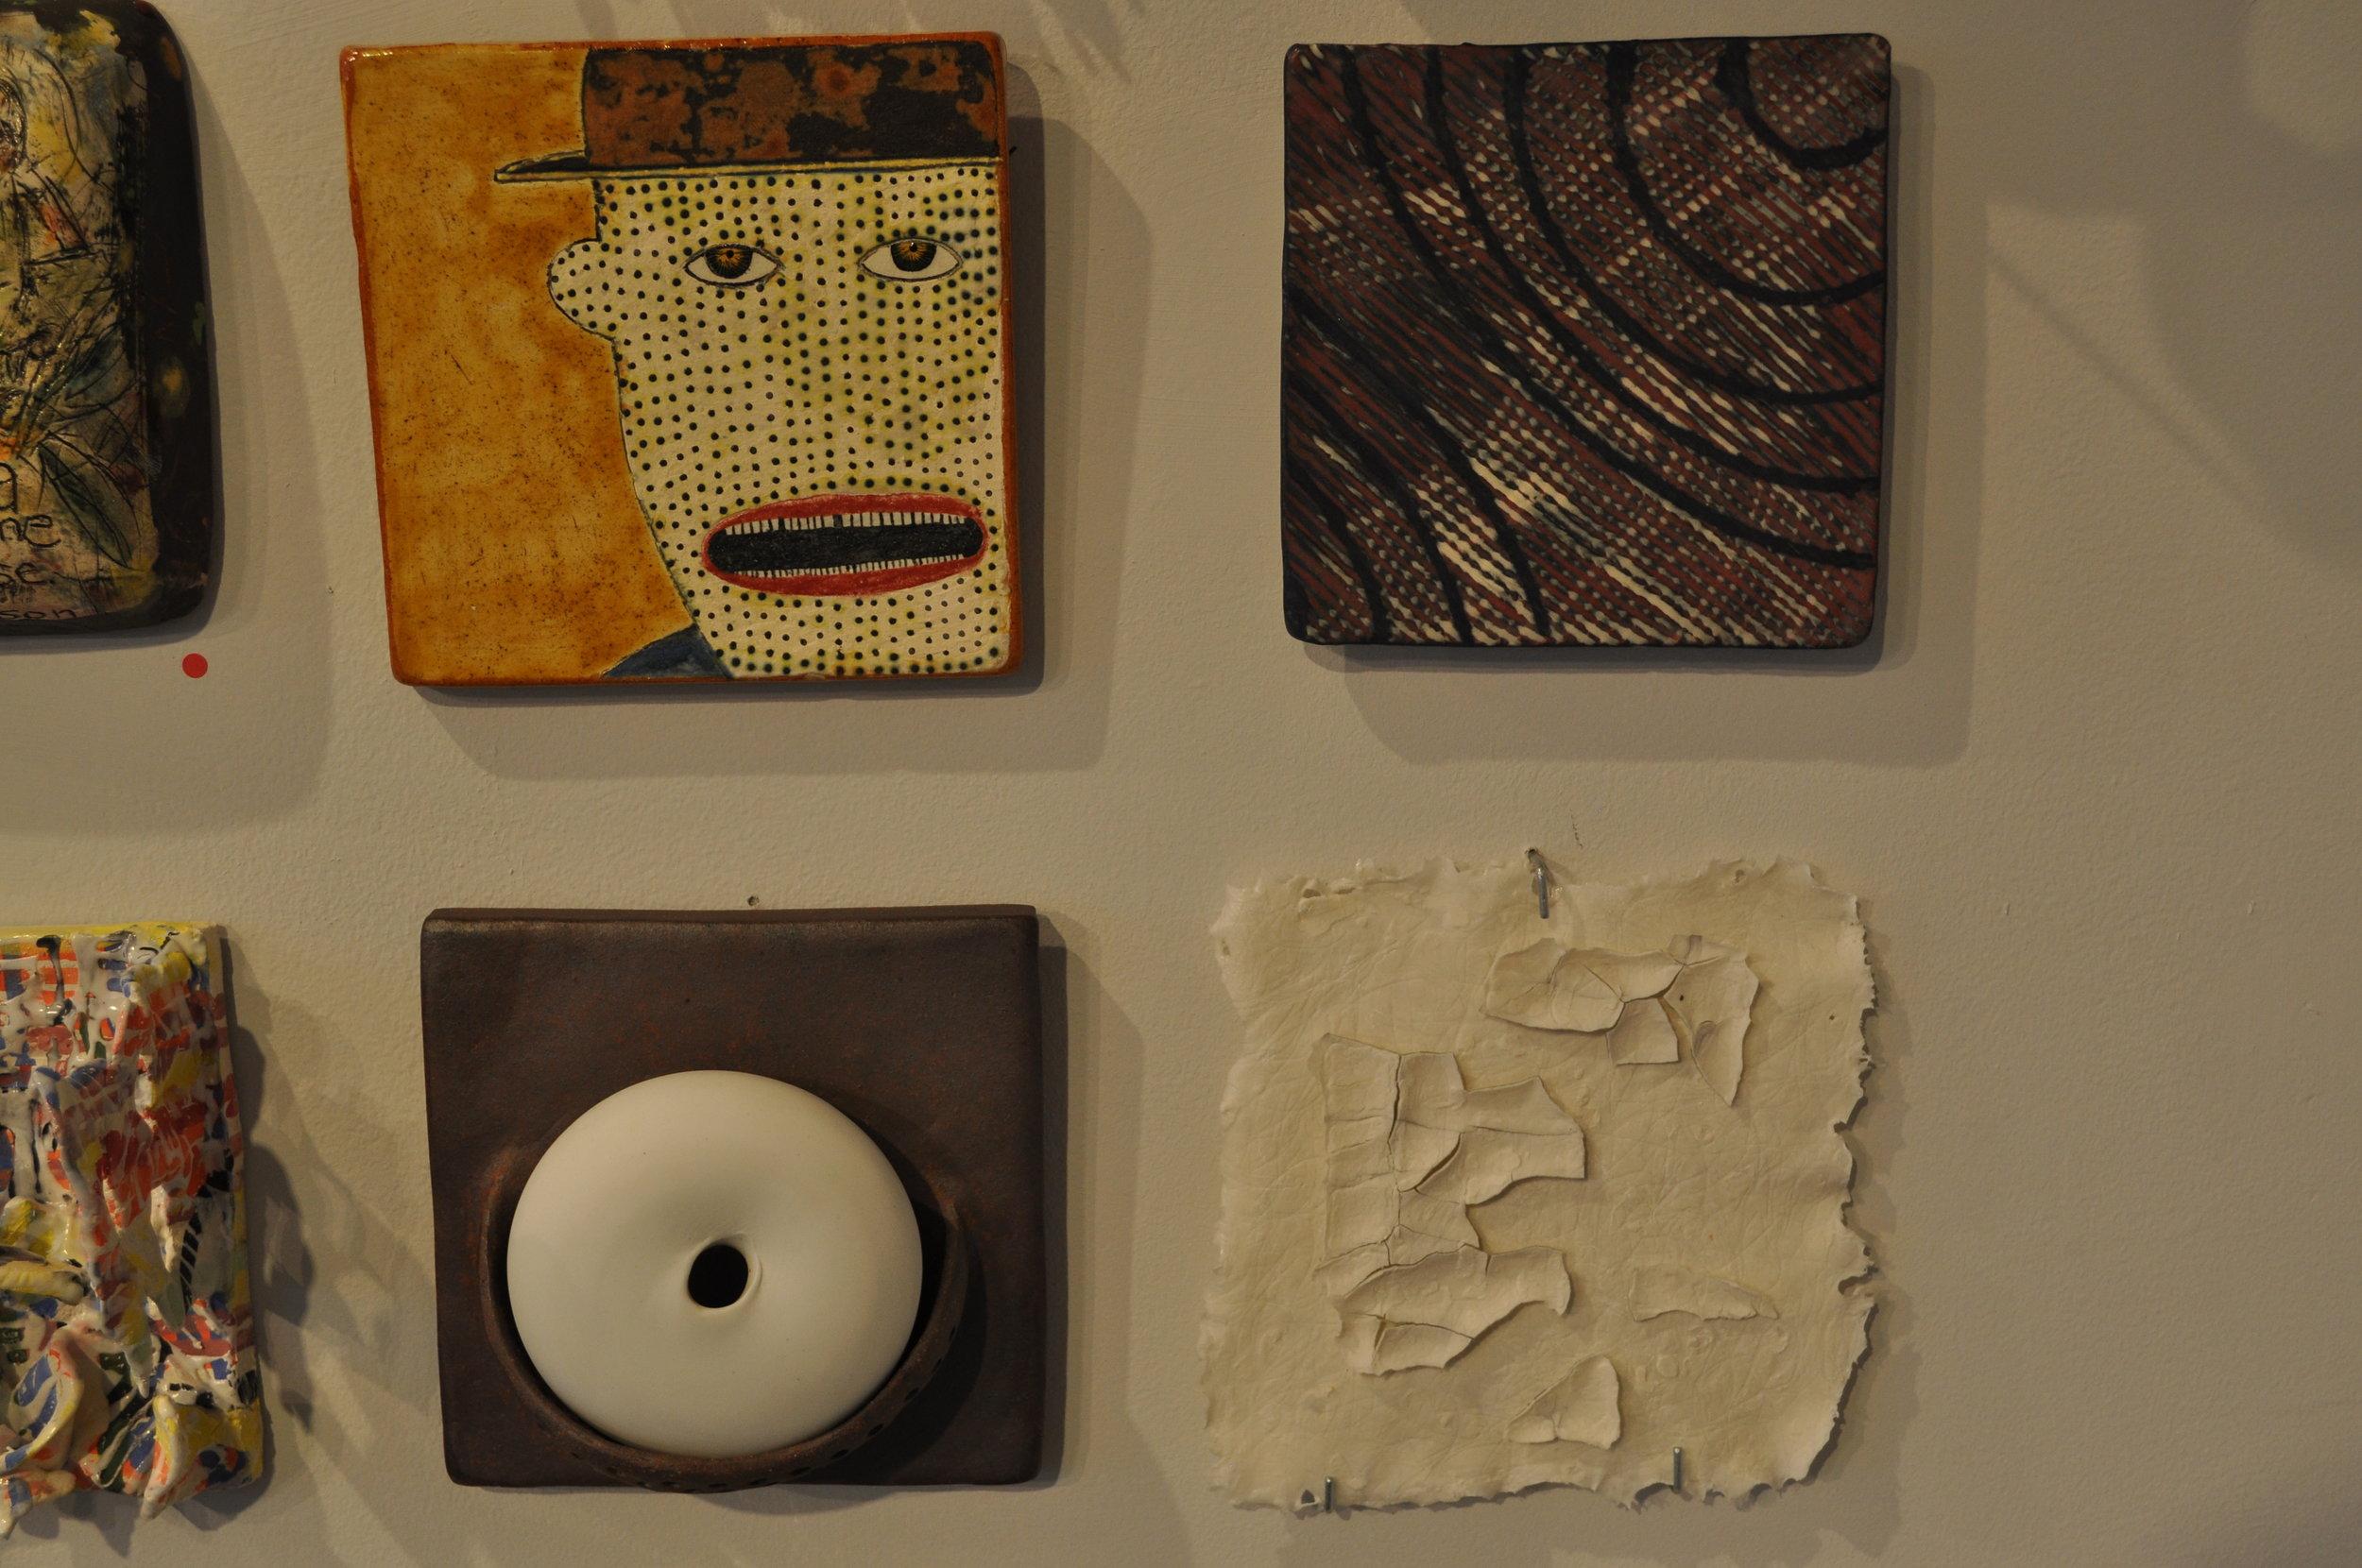 1.  Wesley Anderegg,  Tile #2  (SOLD)  2.  Lana Wilson,  Double Patterned Background  $90  3.  Deborah Lecce,  White Pod Tile- Vase  $120  4.  Clementine Porcelain,  Paper 6x6 (Tracy Shell)  $80